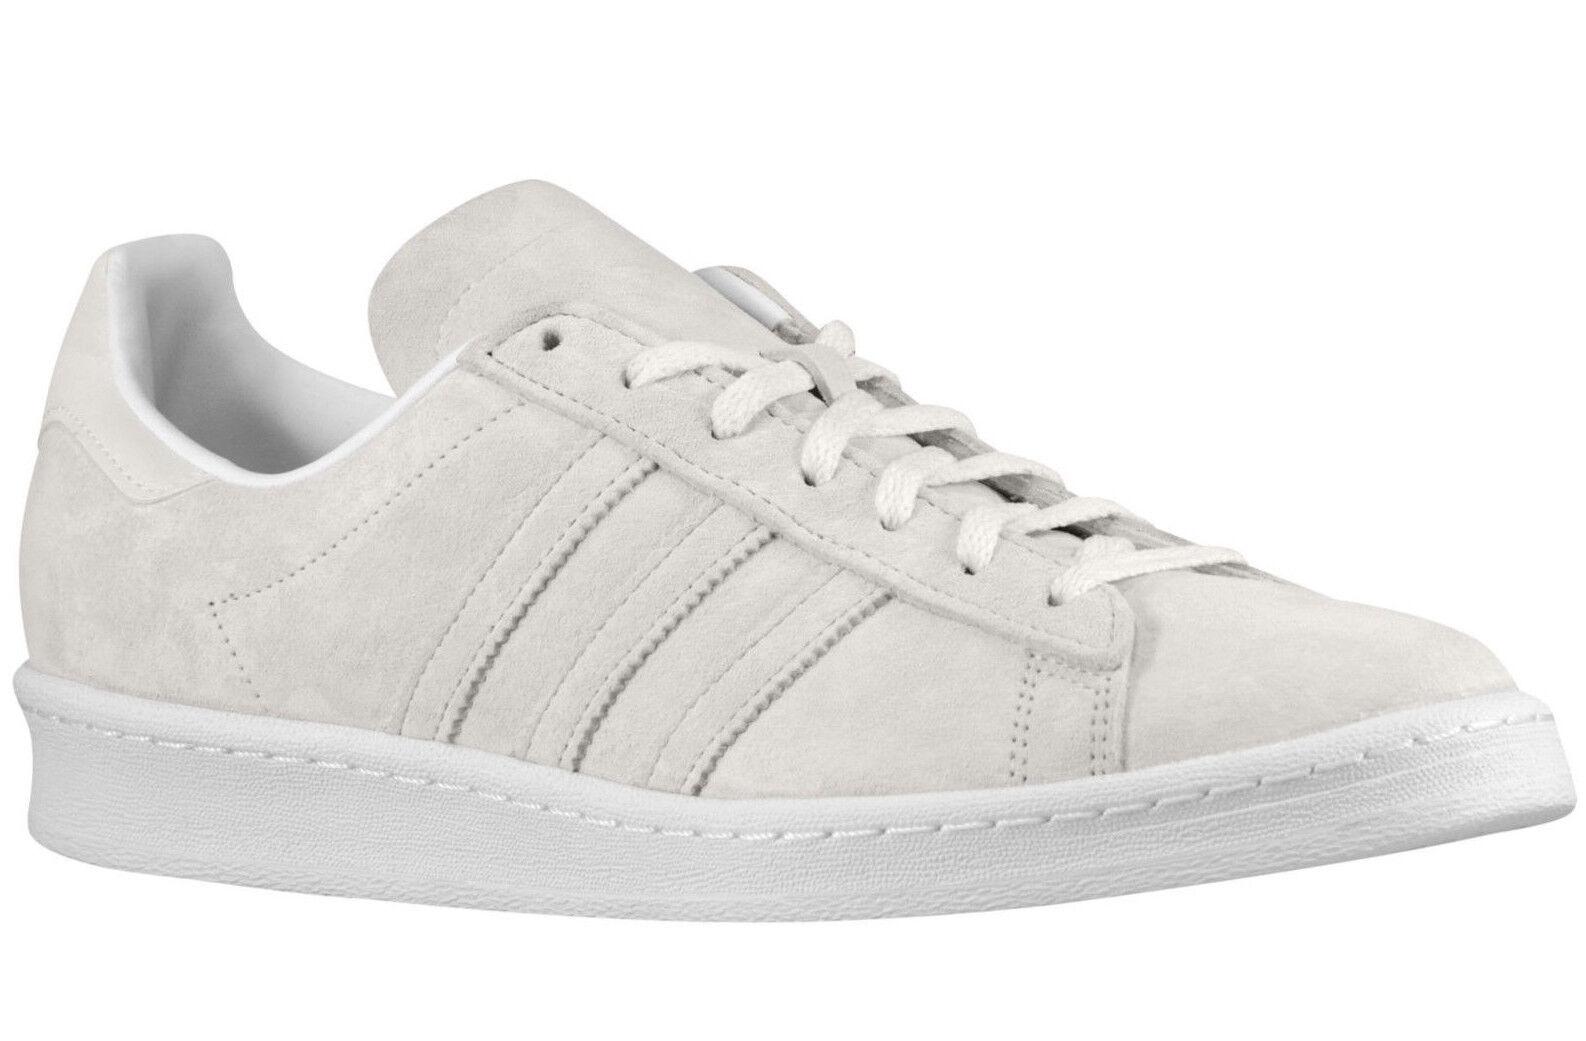 Adidas Originals Campus 80's Talla 13 blanco blancoo rojoo Shelltoe DMC Superstar